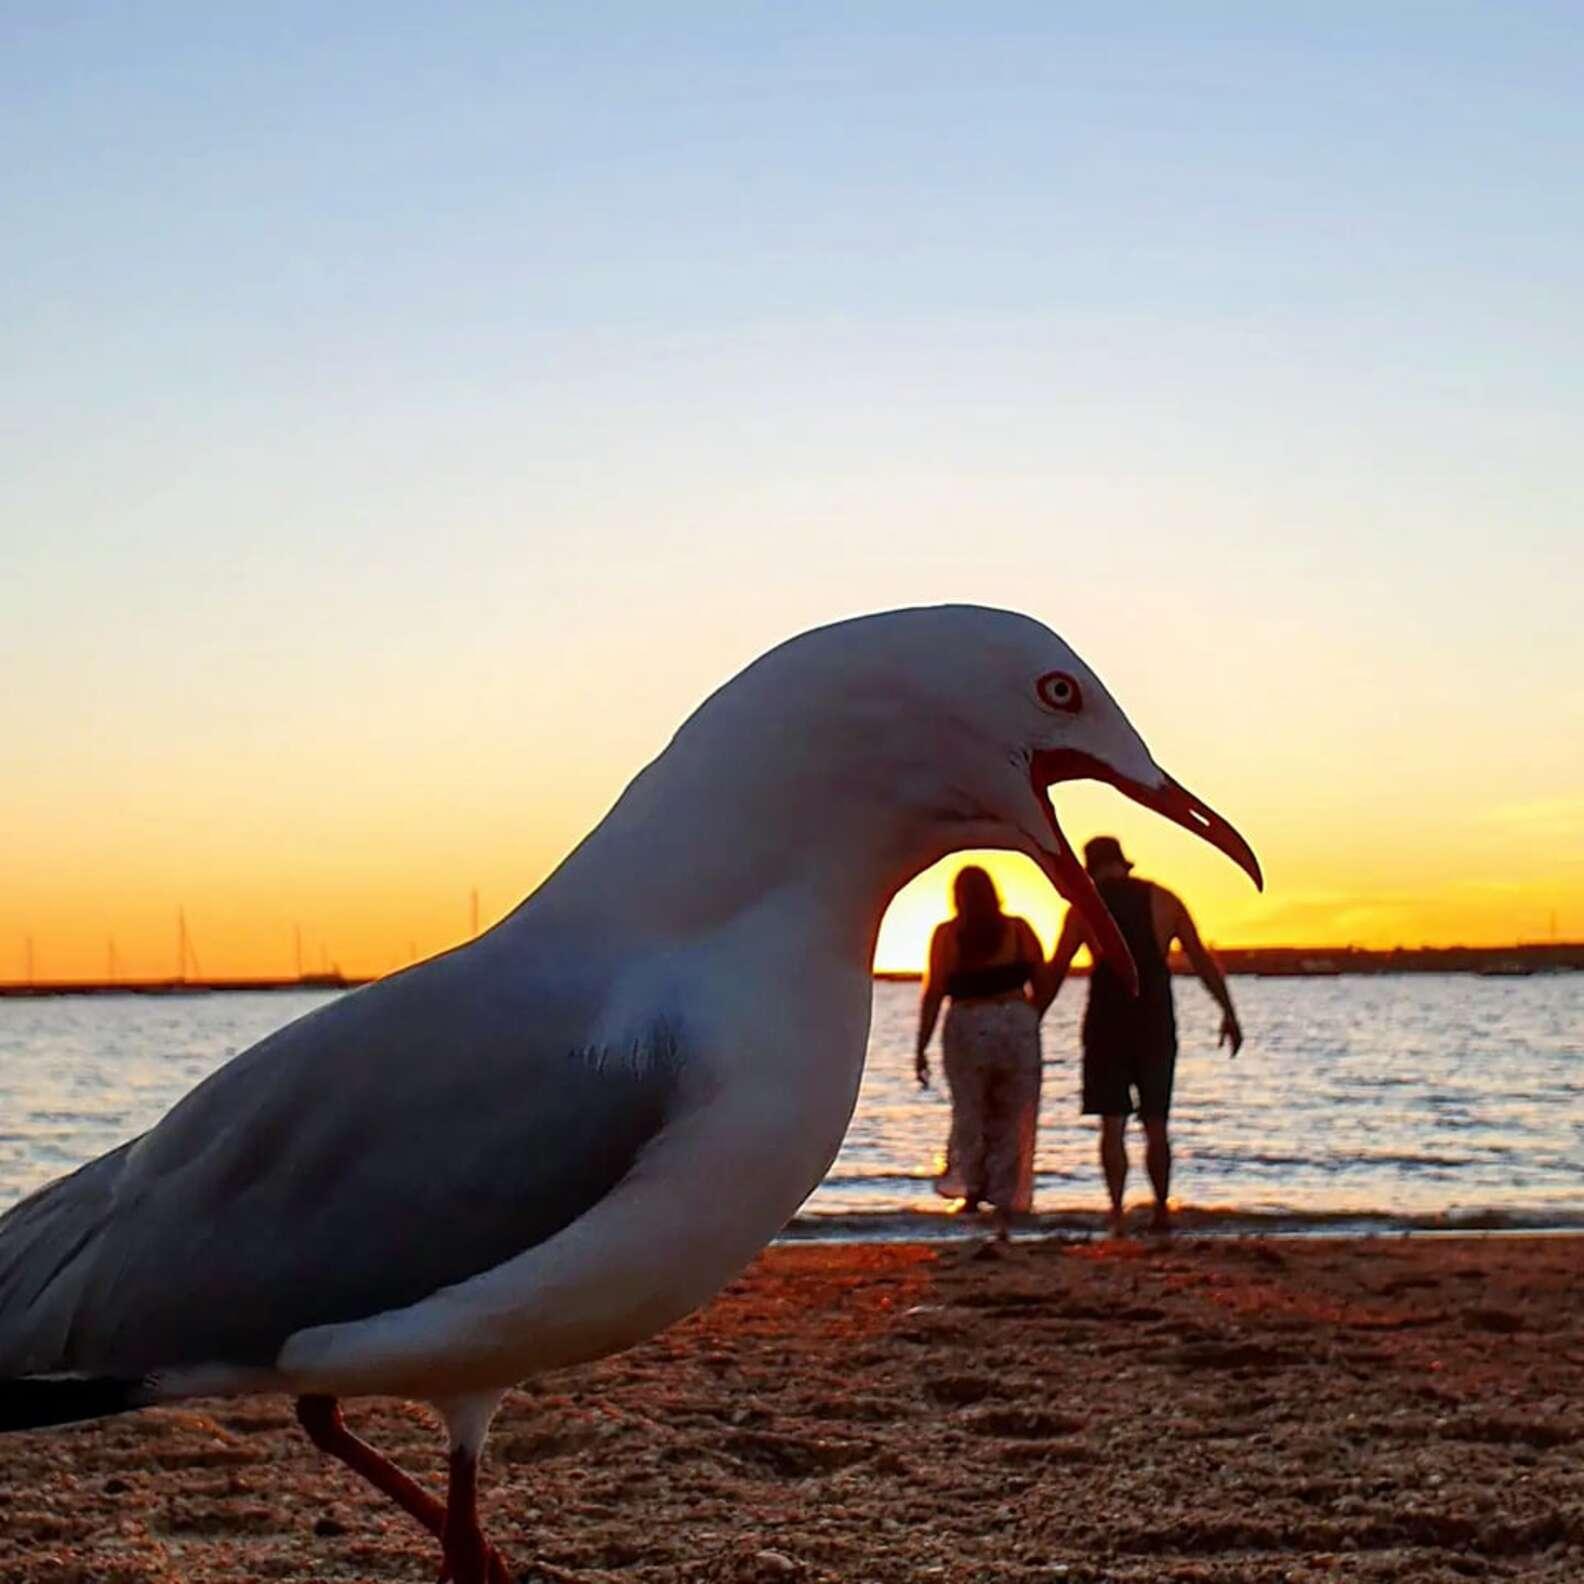 Seagulls Ruin Couple's Plan to Record Cute Beach Moment